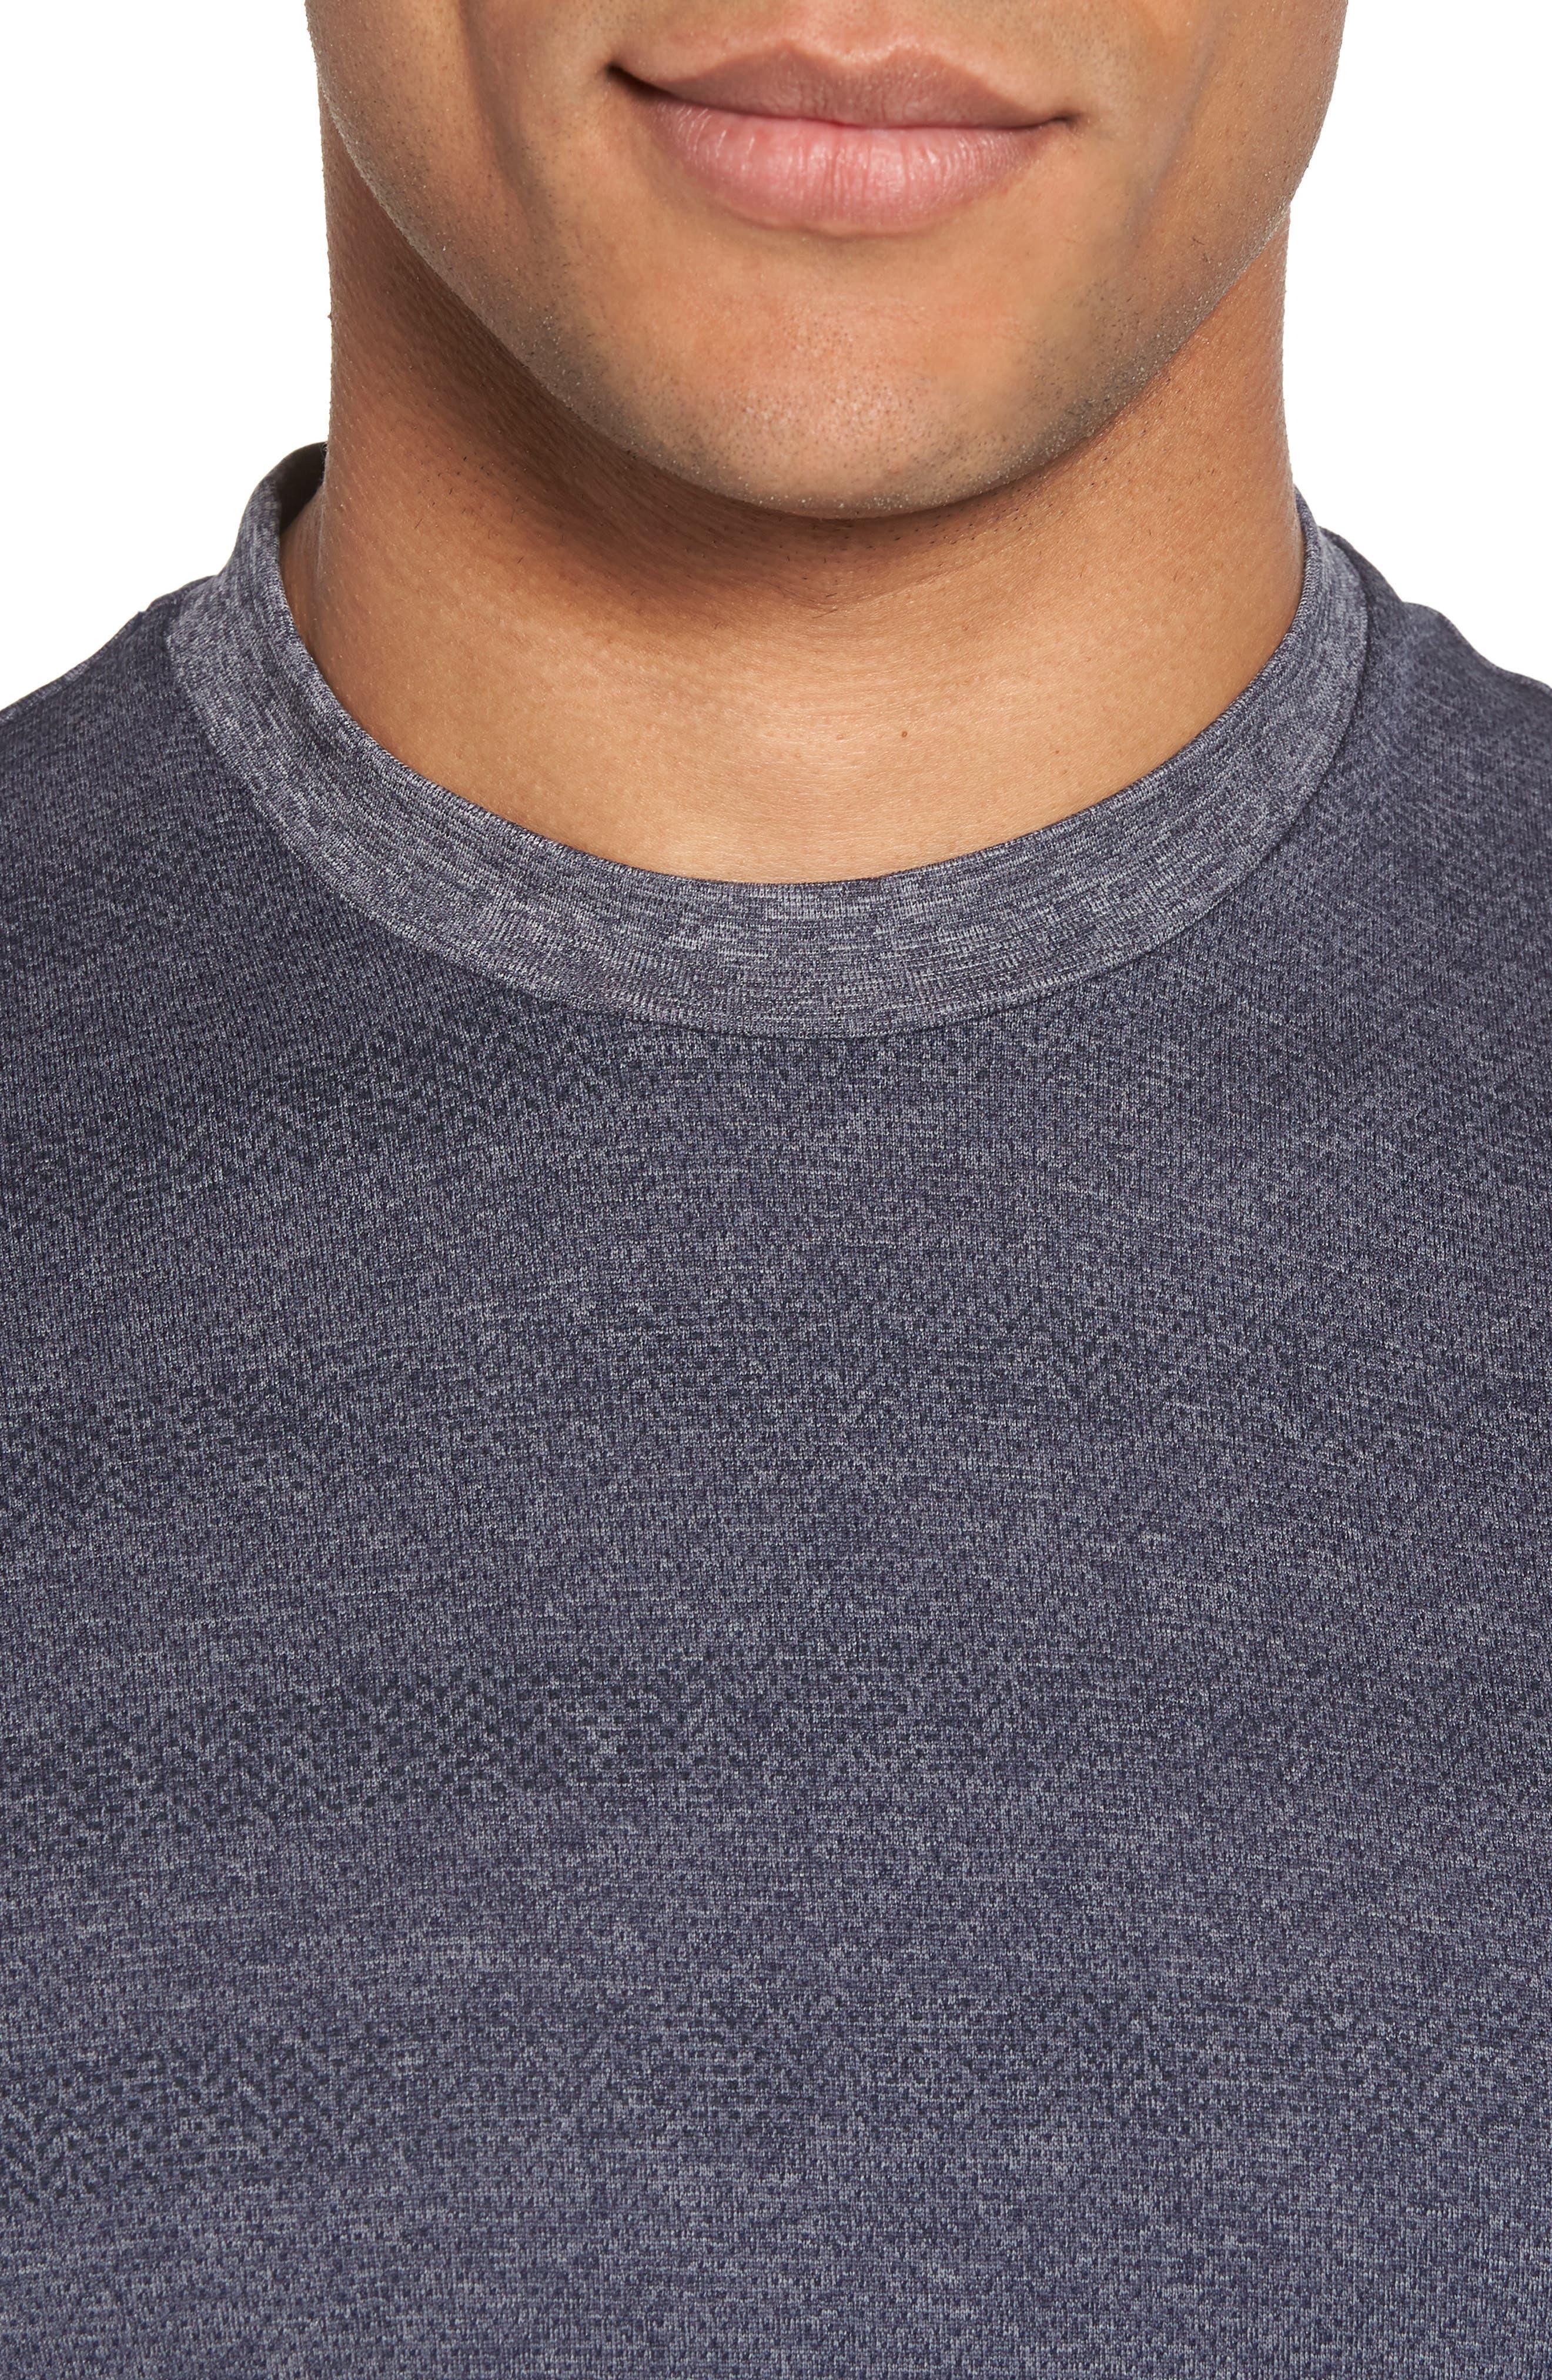 Upshift T-Shirt,                             Alternate thumbnail 4, color,                             HEATHER GRIFFIN